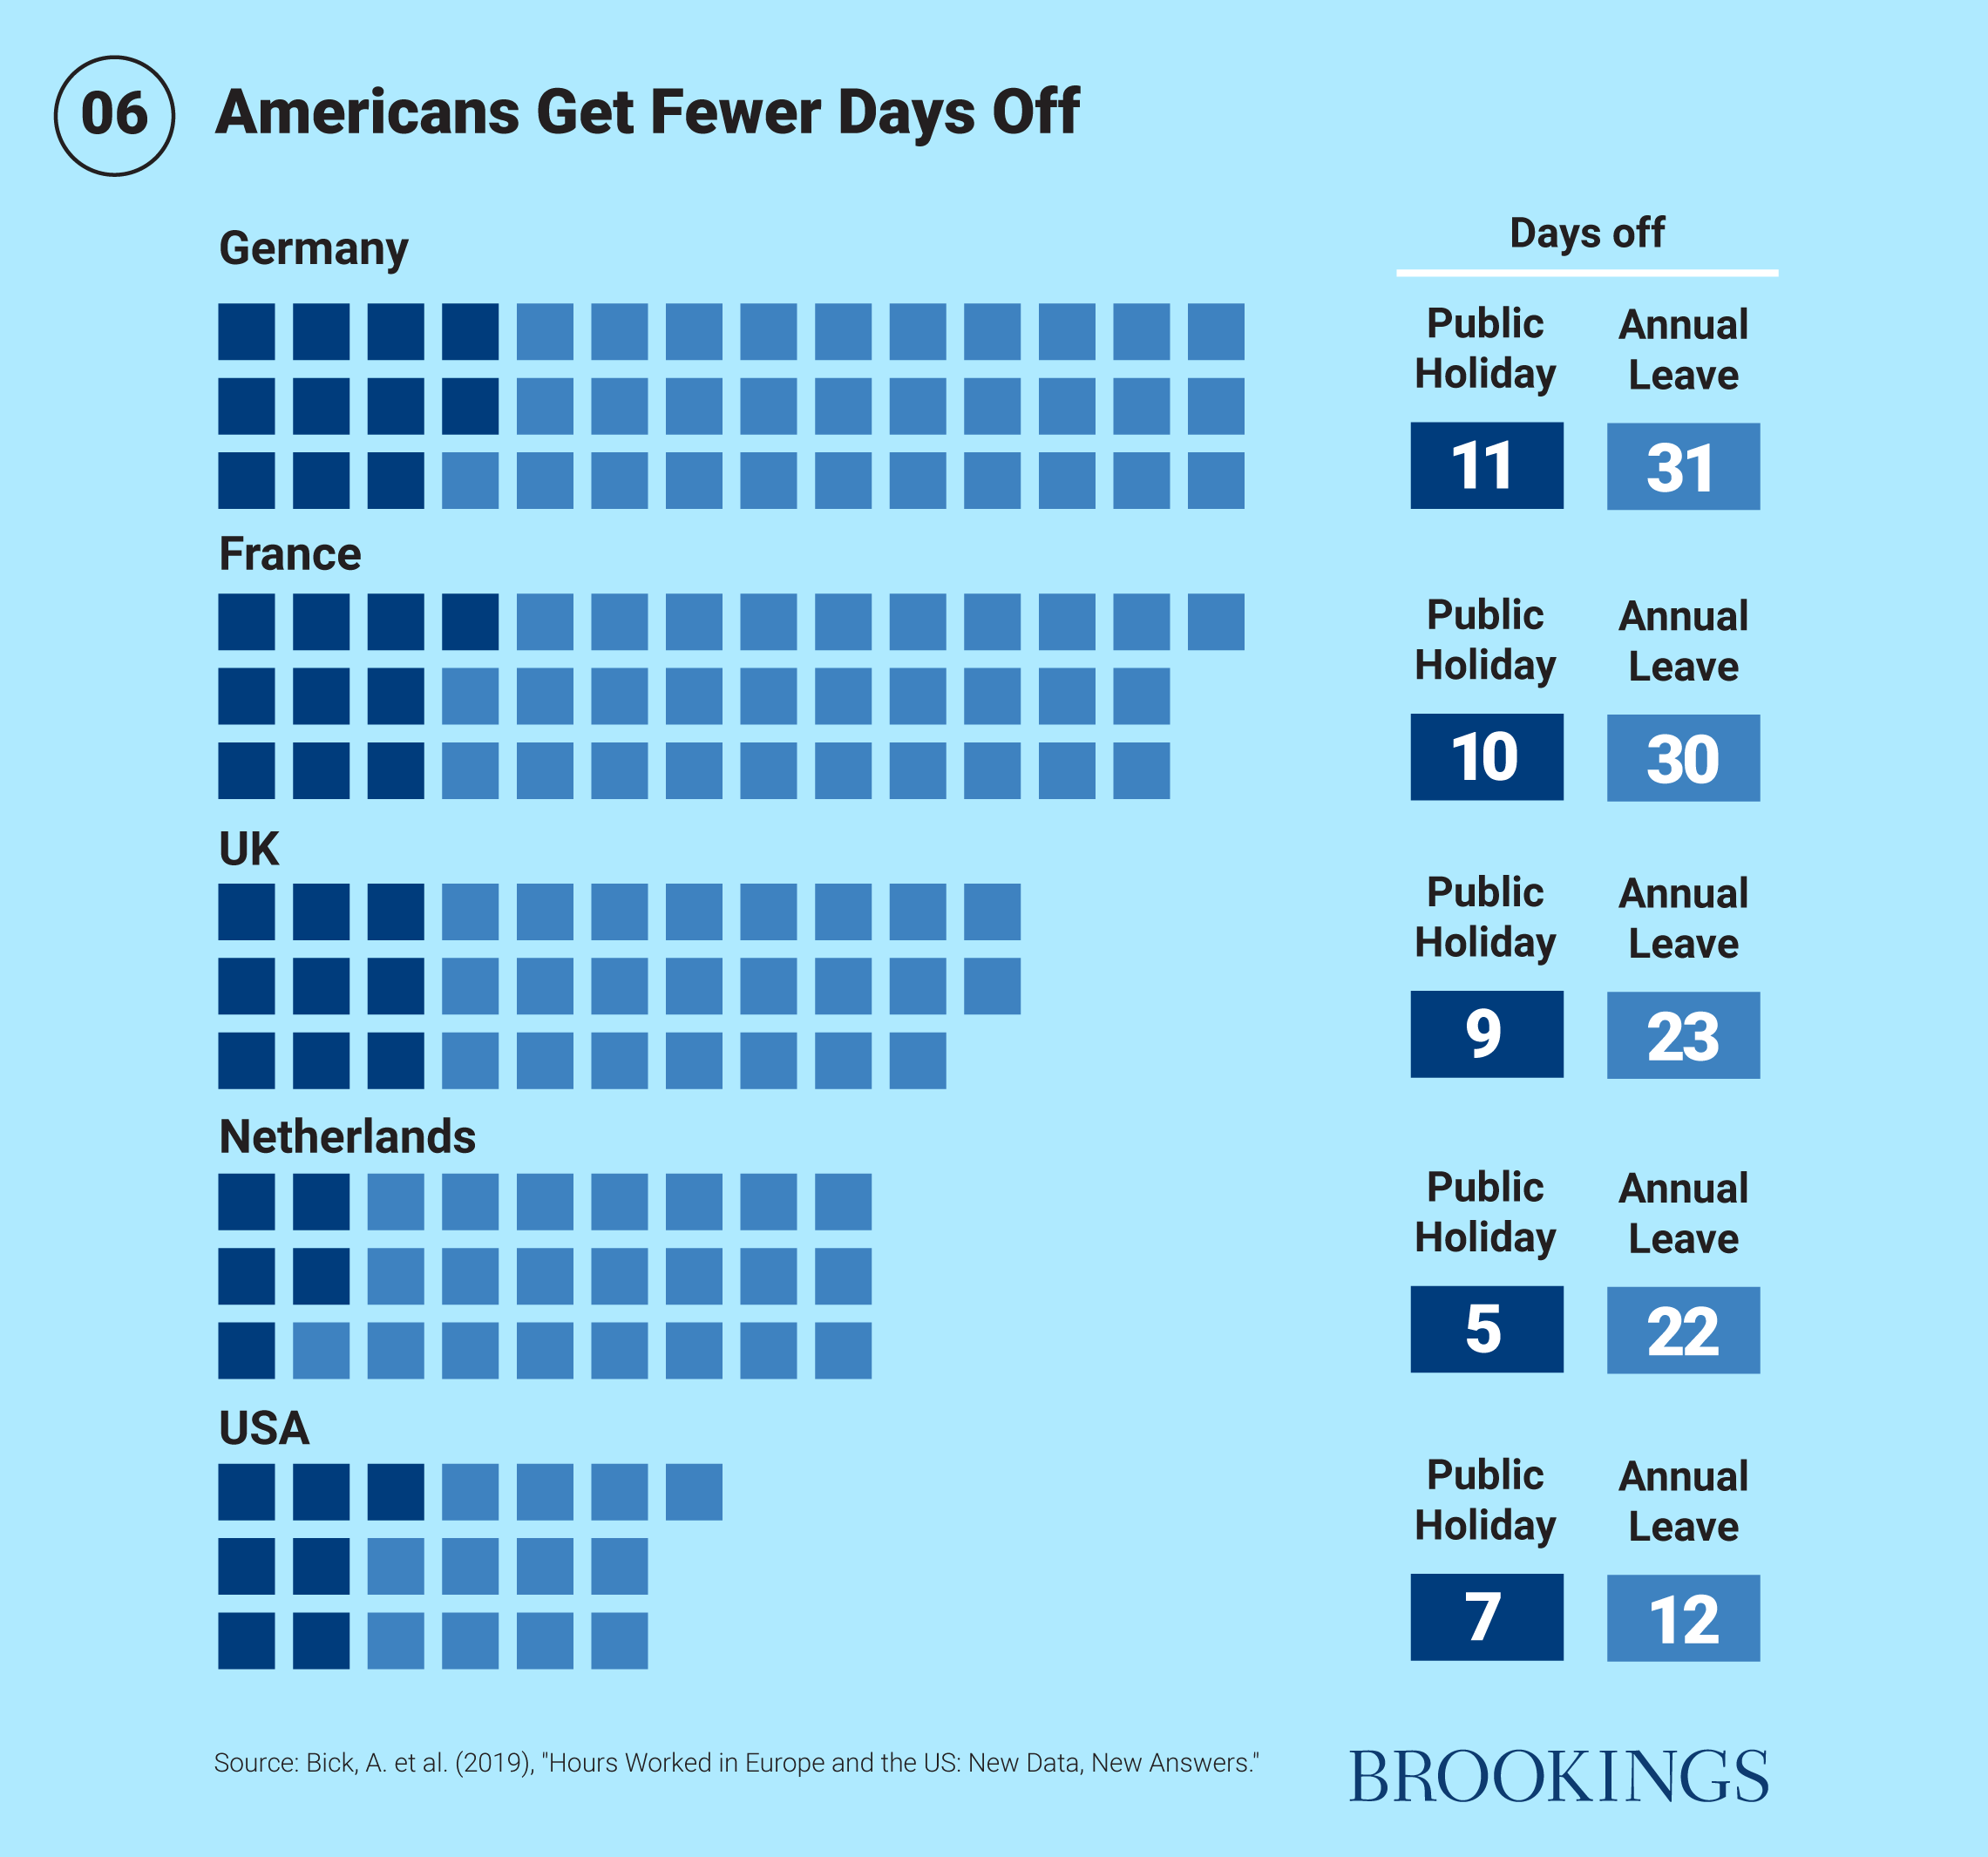 Americans get fewer days off